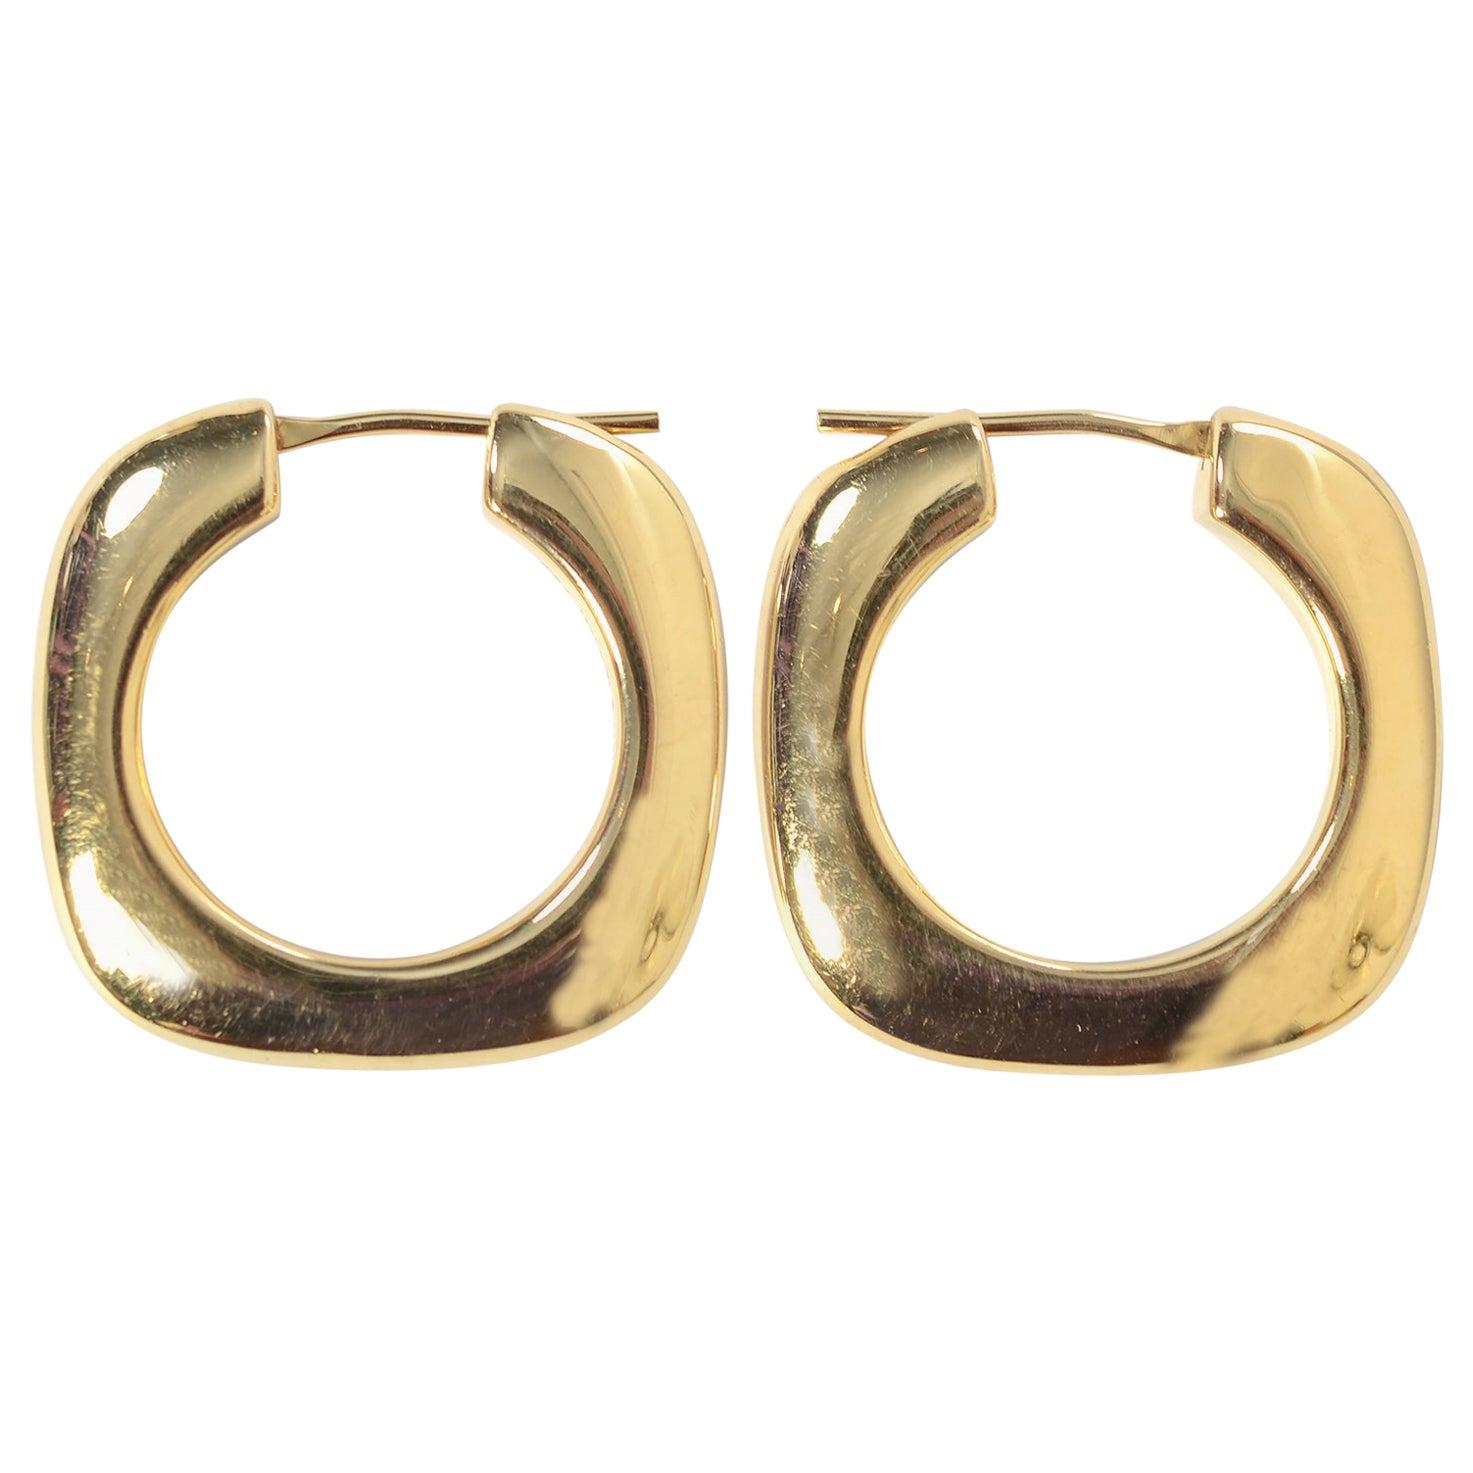 Tiffany & Co. Square Hoop Gold Earrings